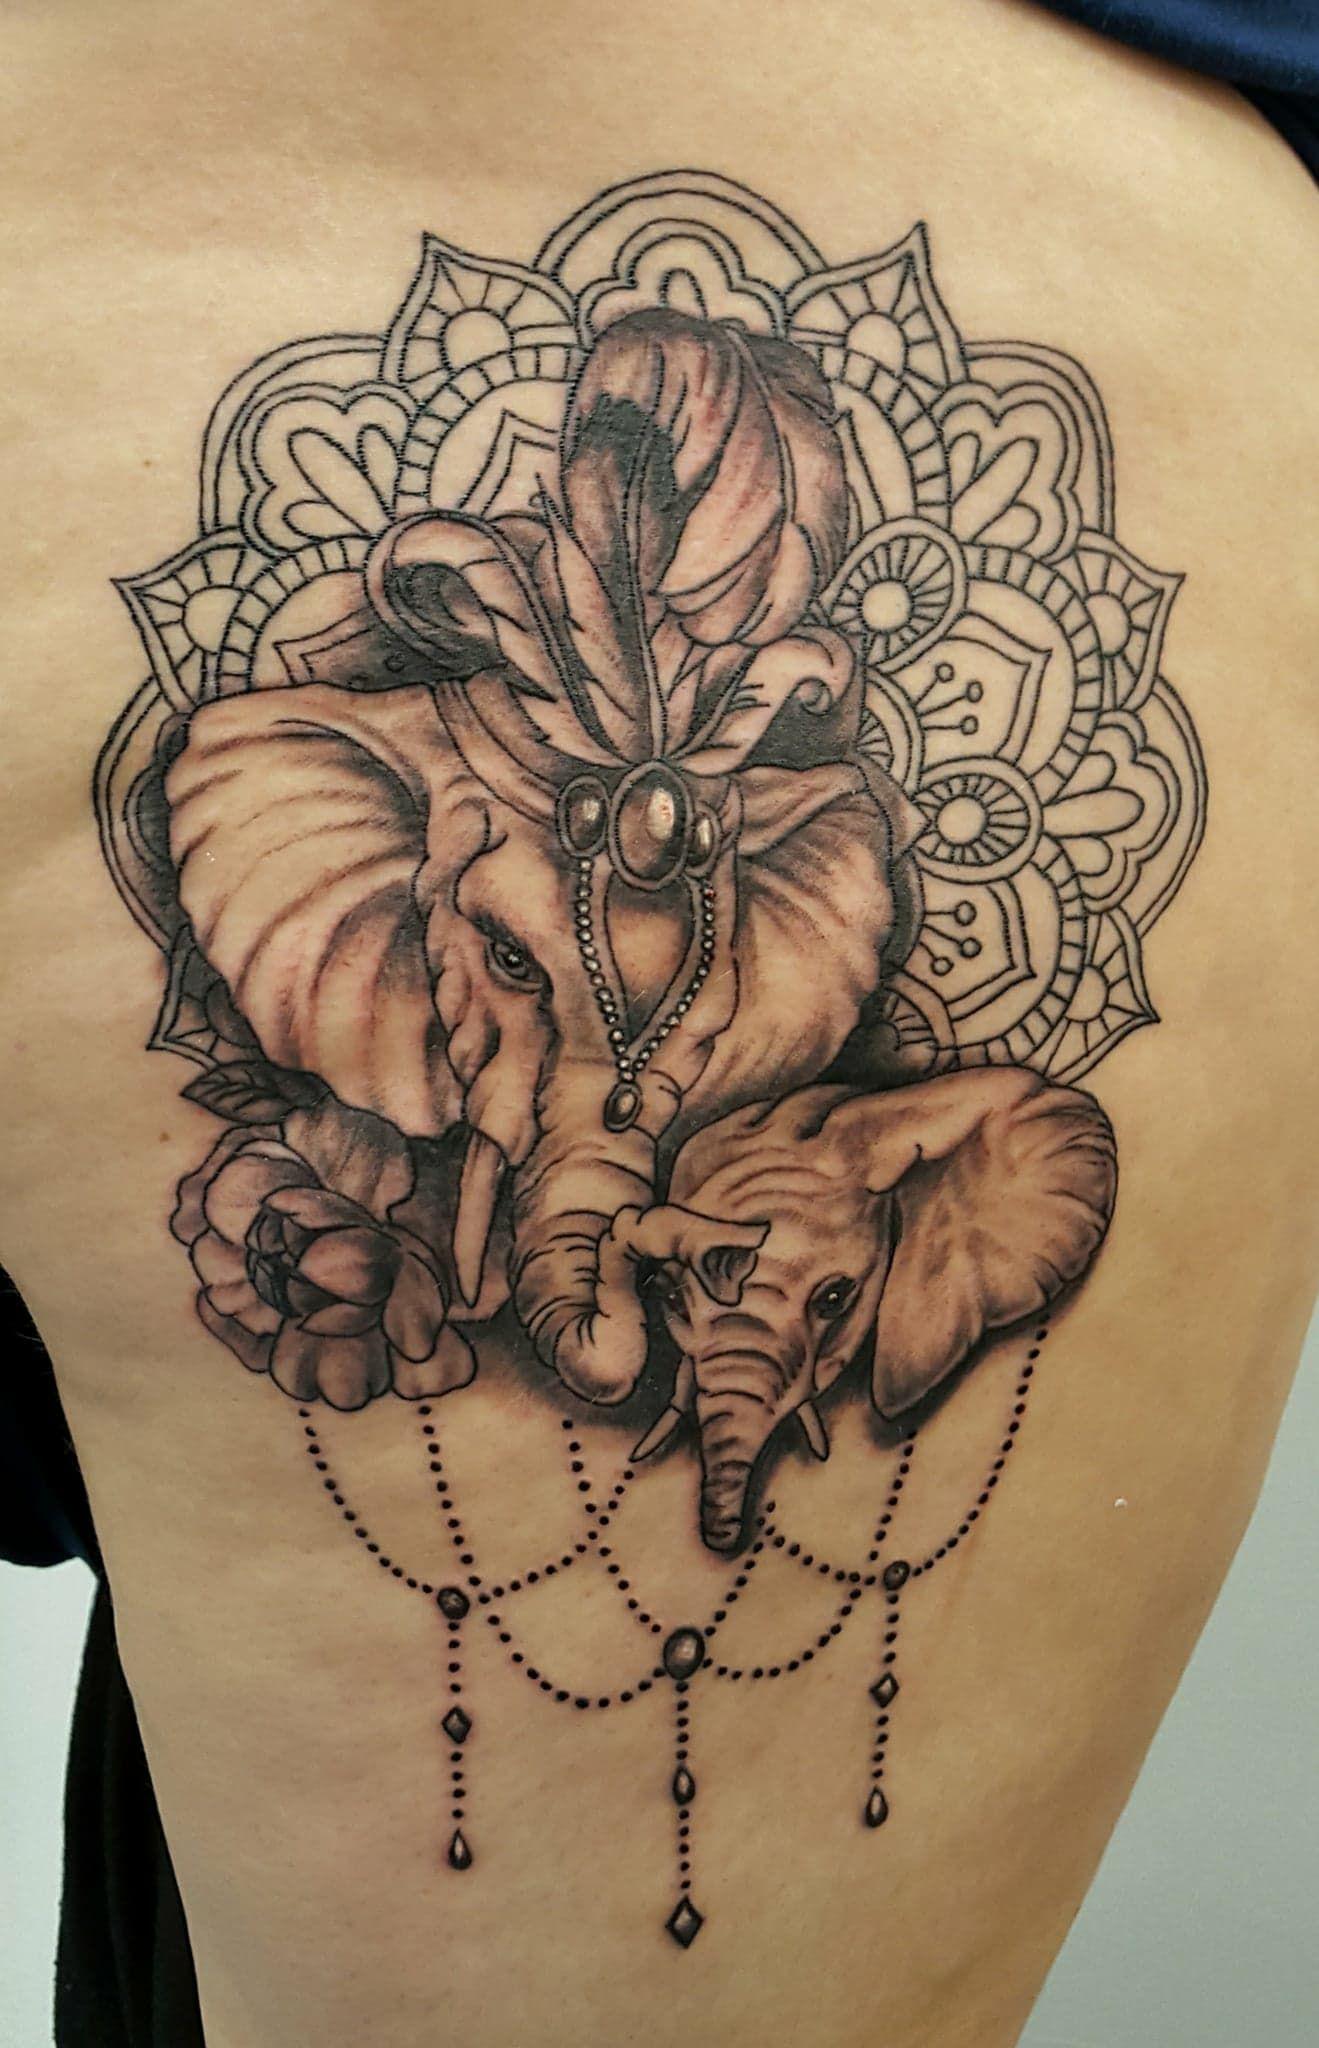 Mummy and baby elephant tattoo with mandala, flowers and